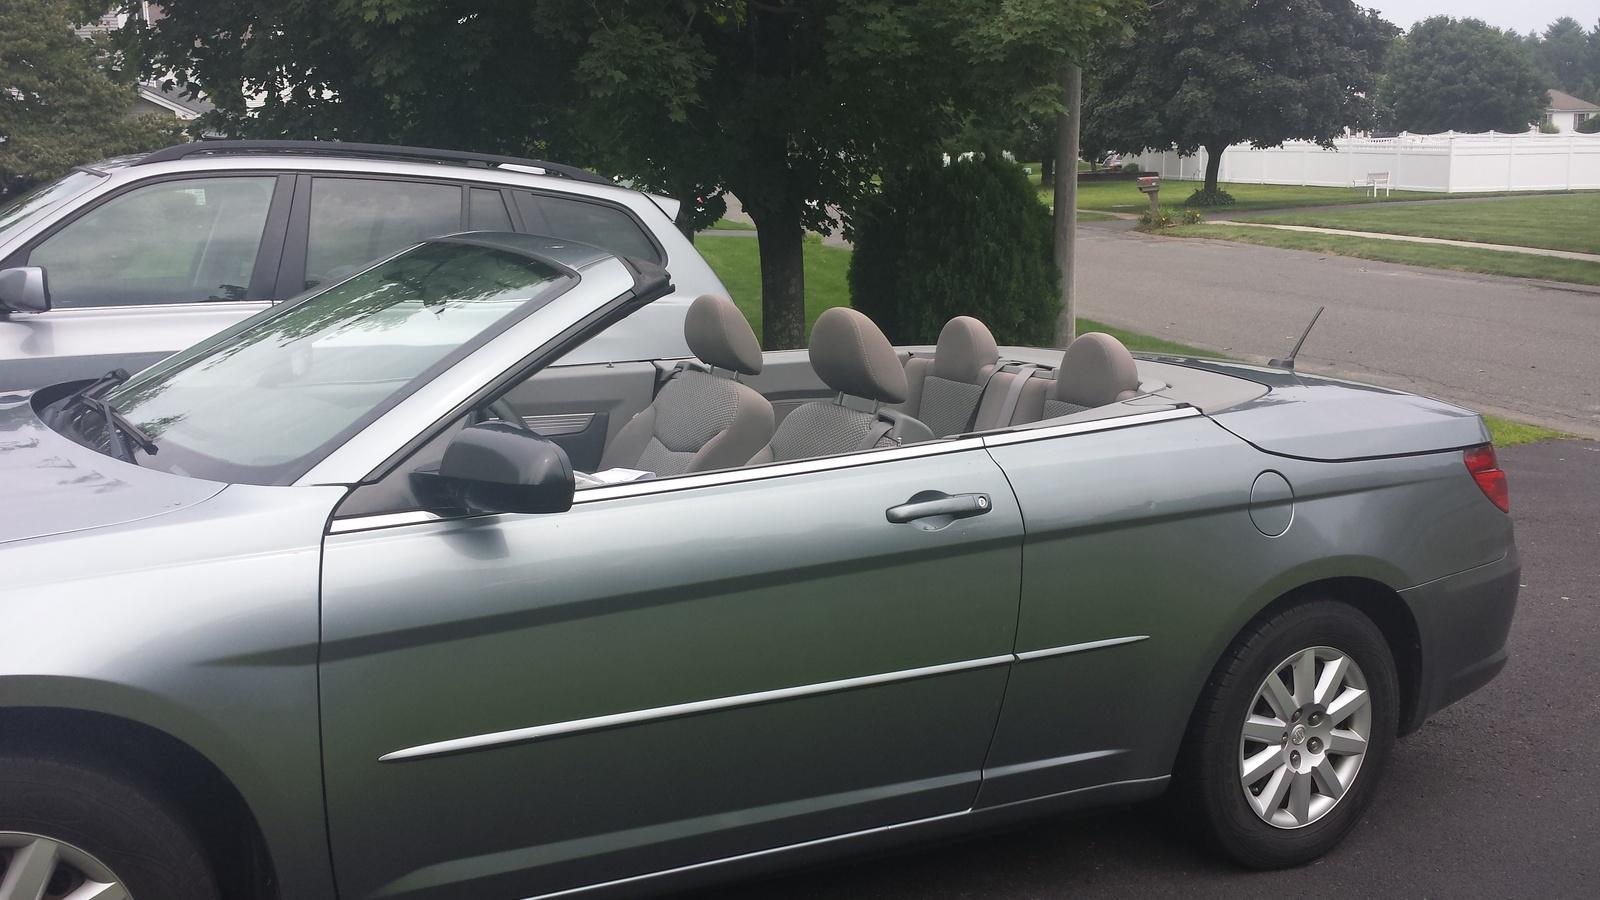 01 Chrysler sebring convertible #3